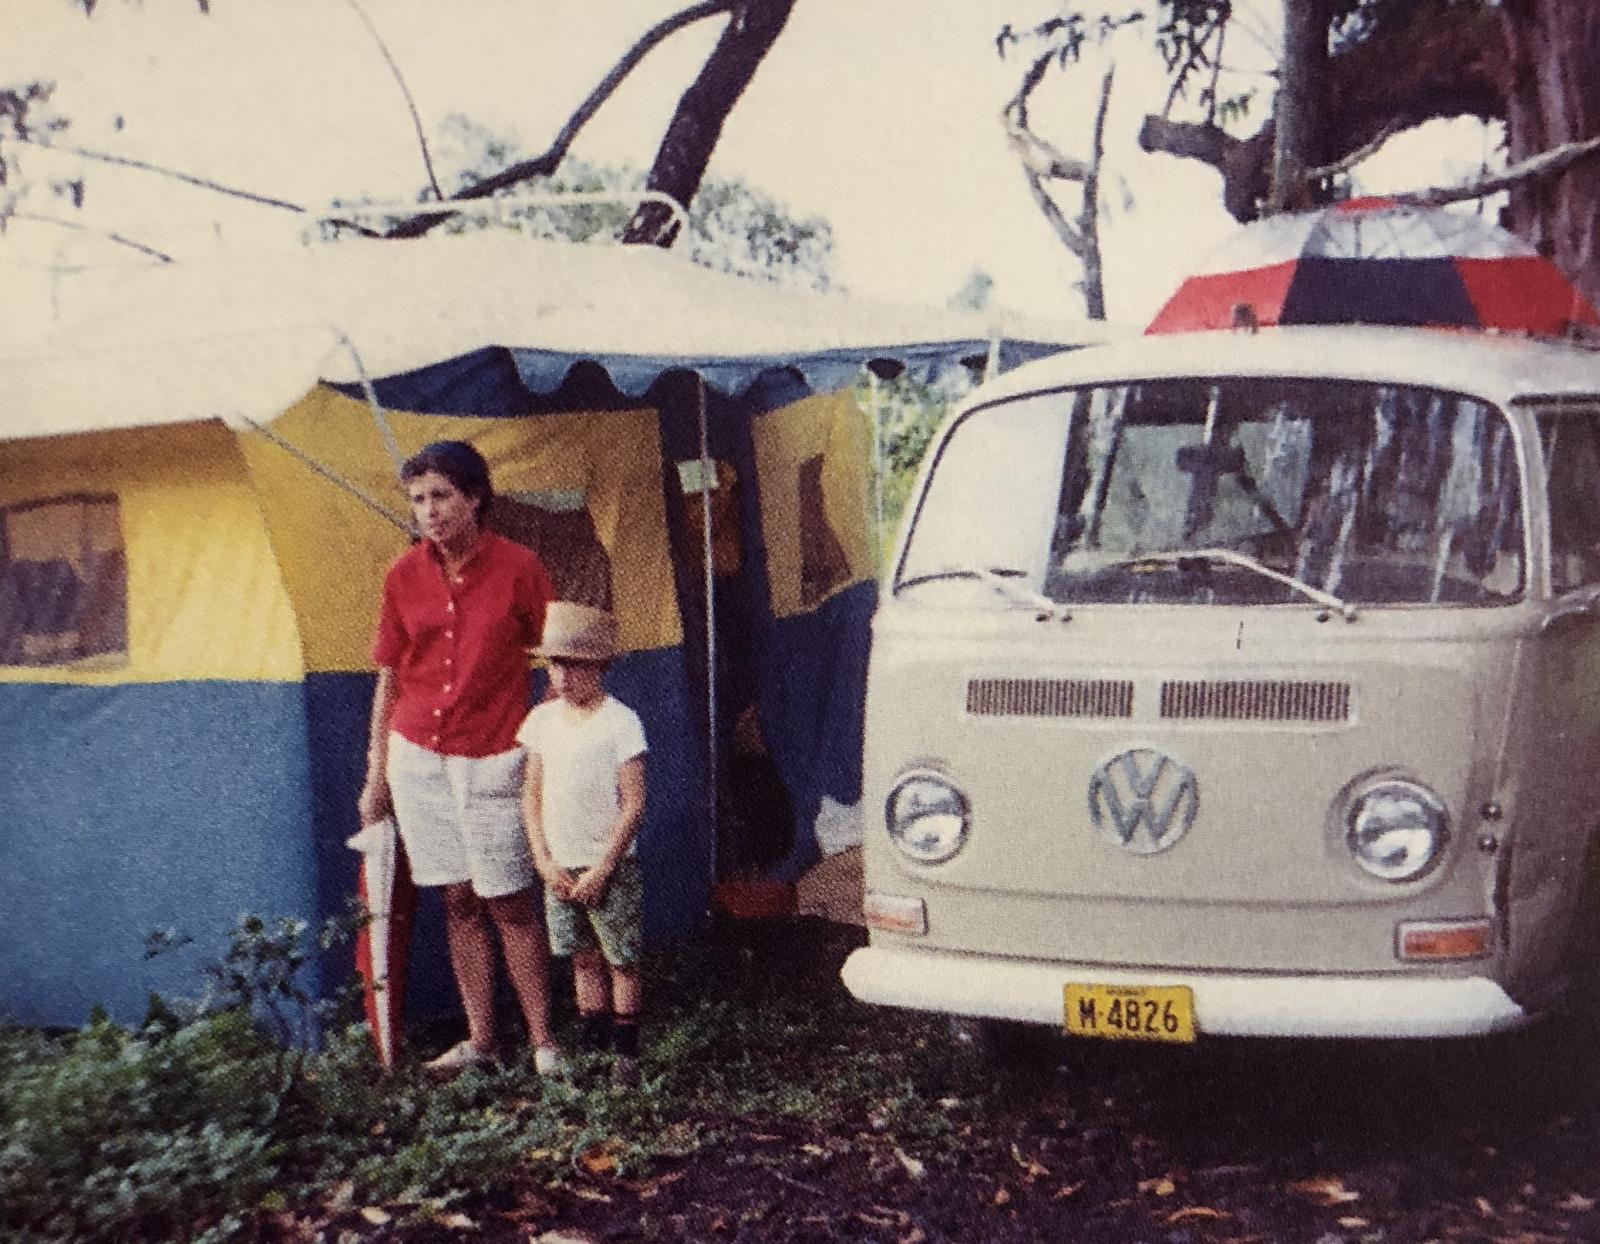 Camping in 1968 Hawai'i